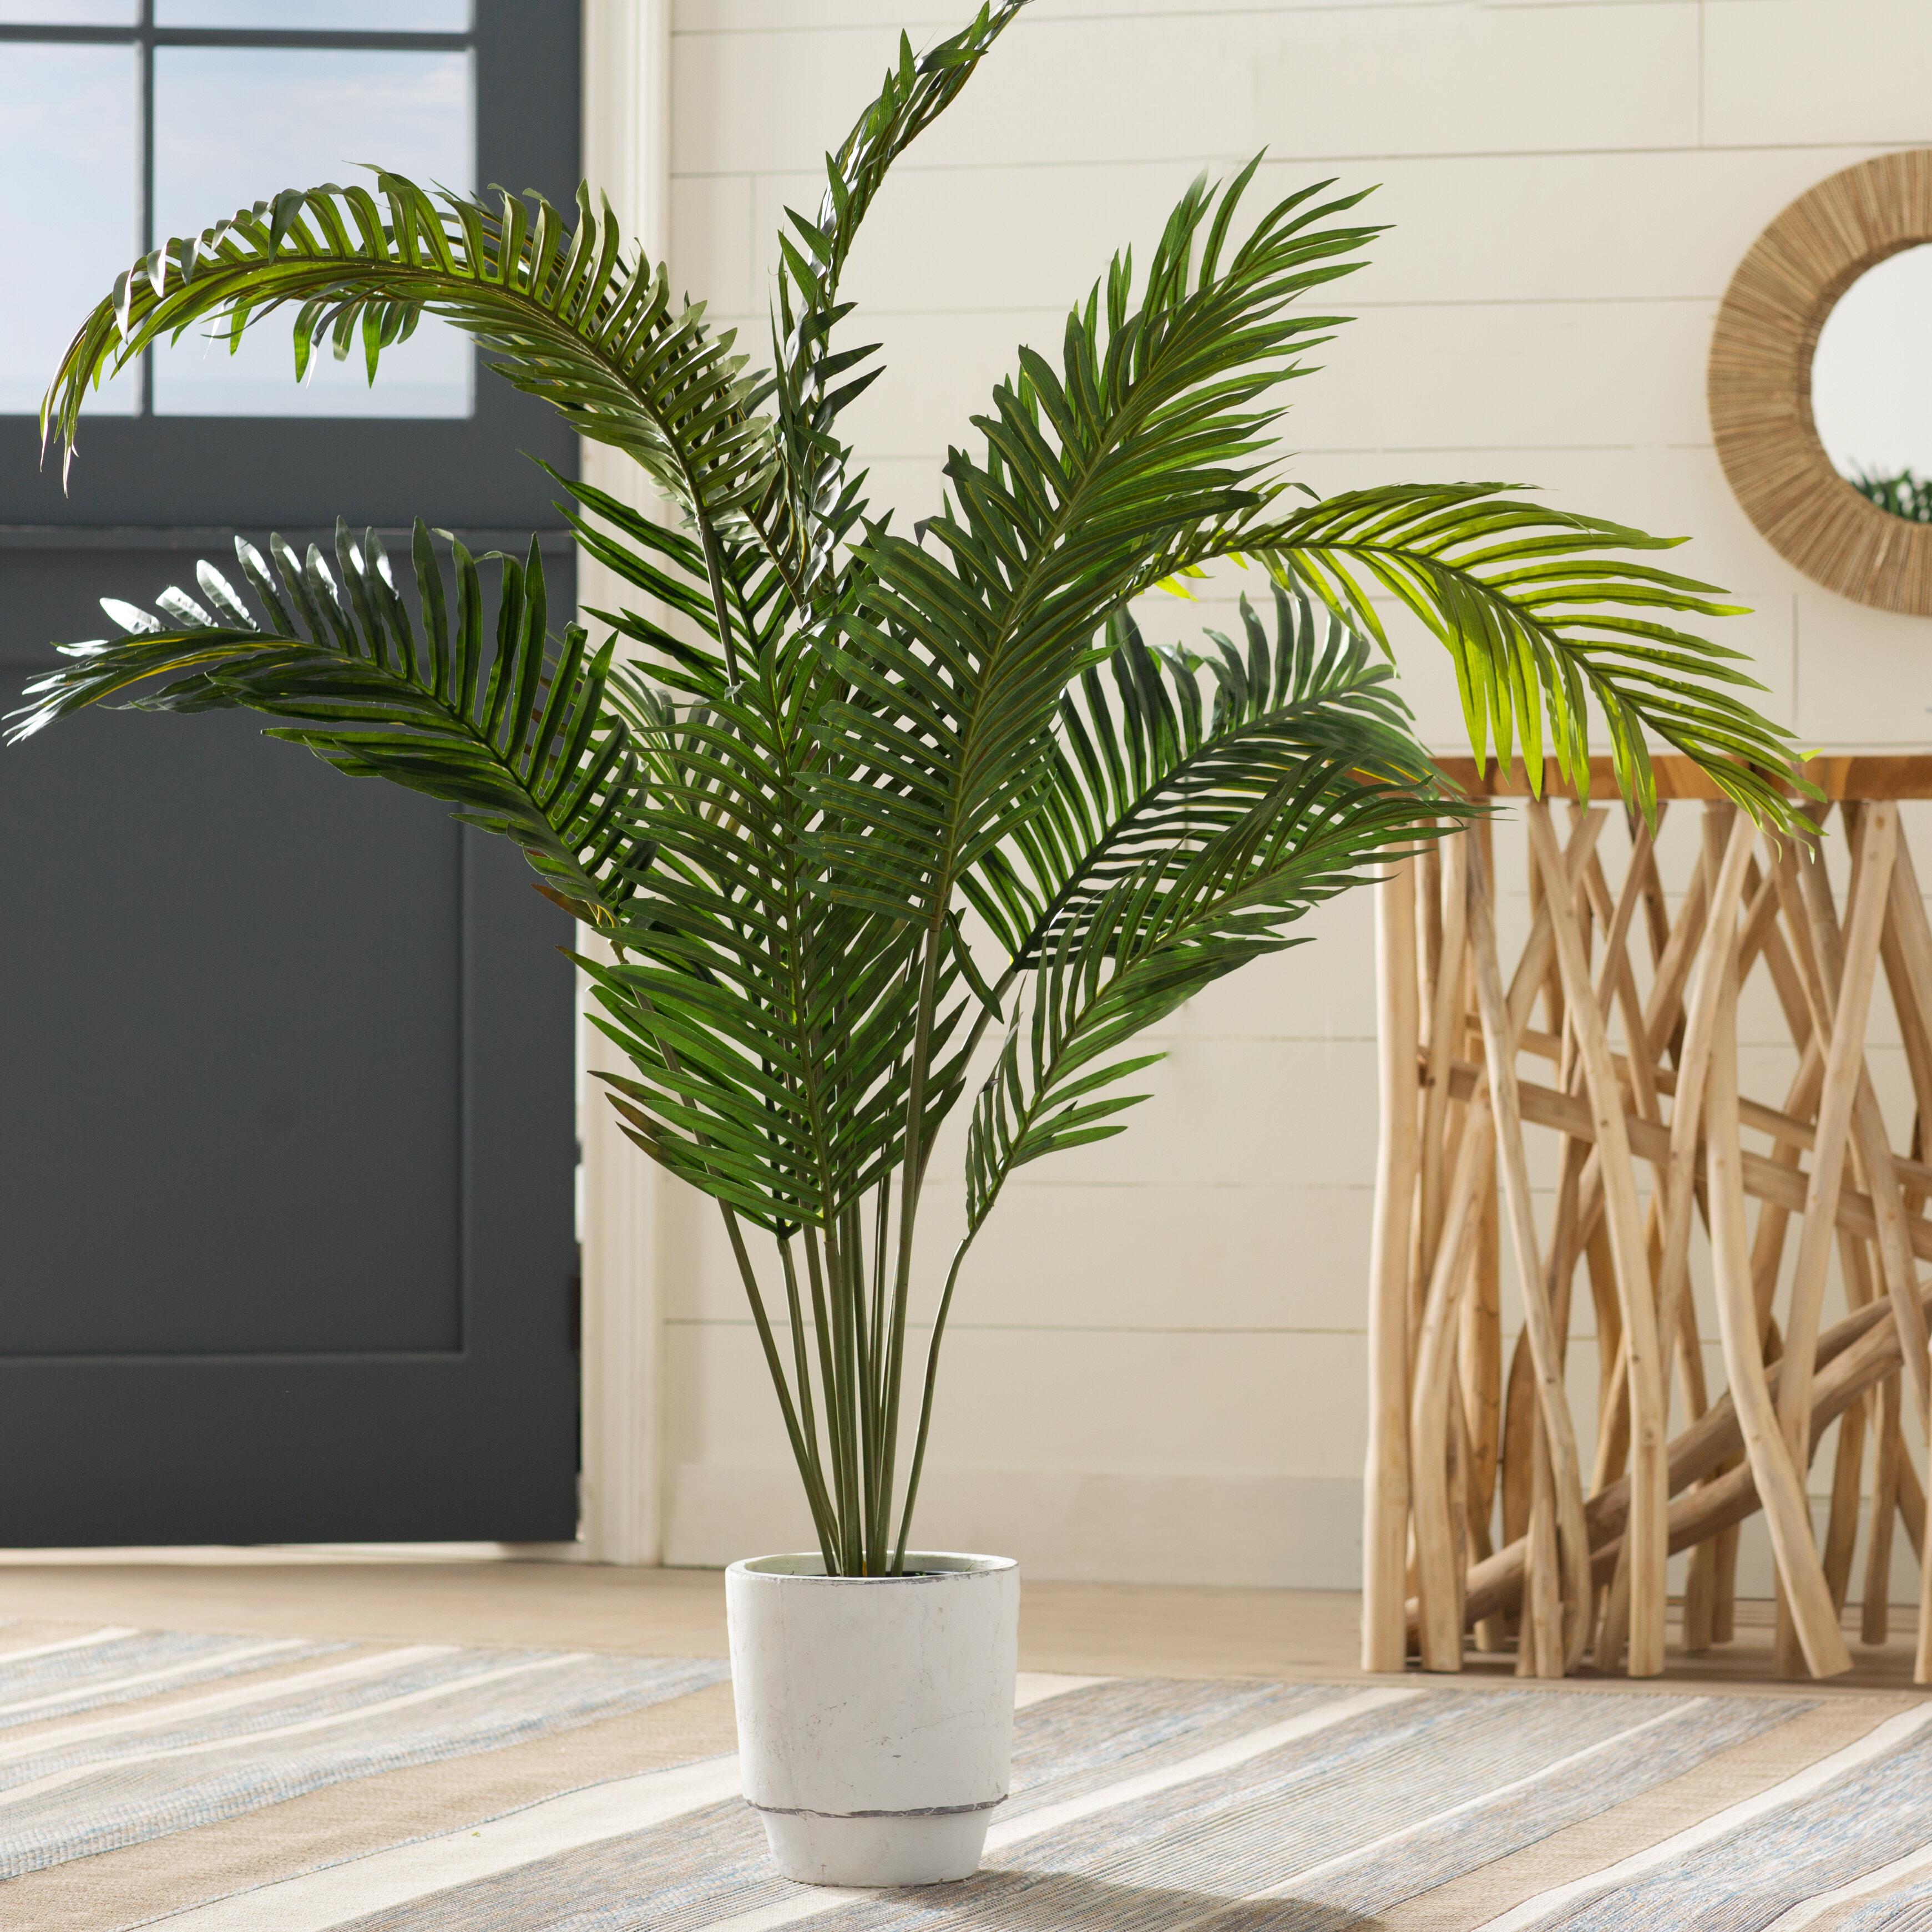 Beachcrest Home Black Hammock Floor Palm Tree in Pot & Reviews | Wayfair